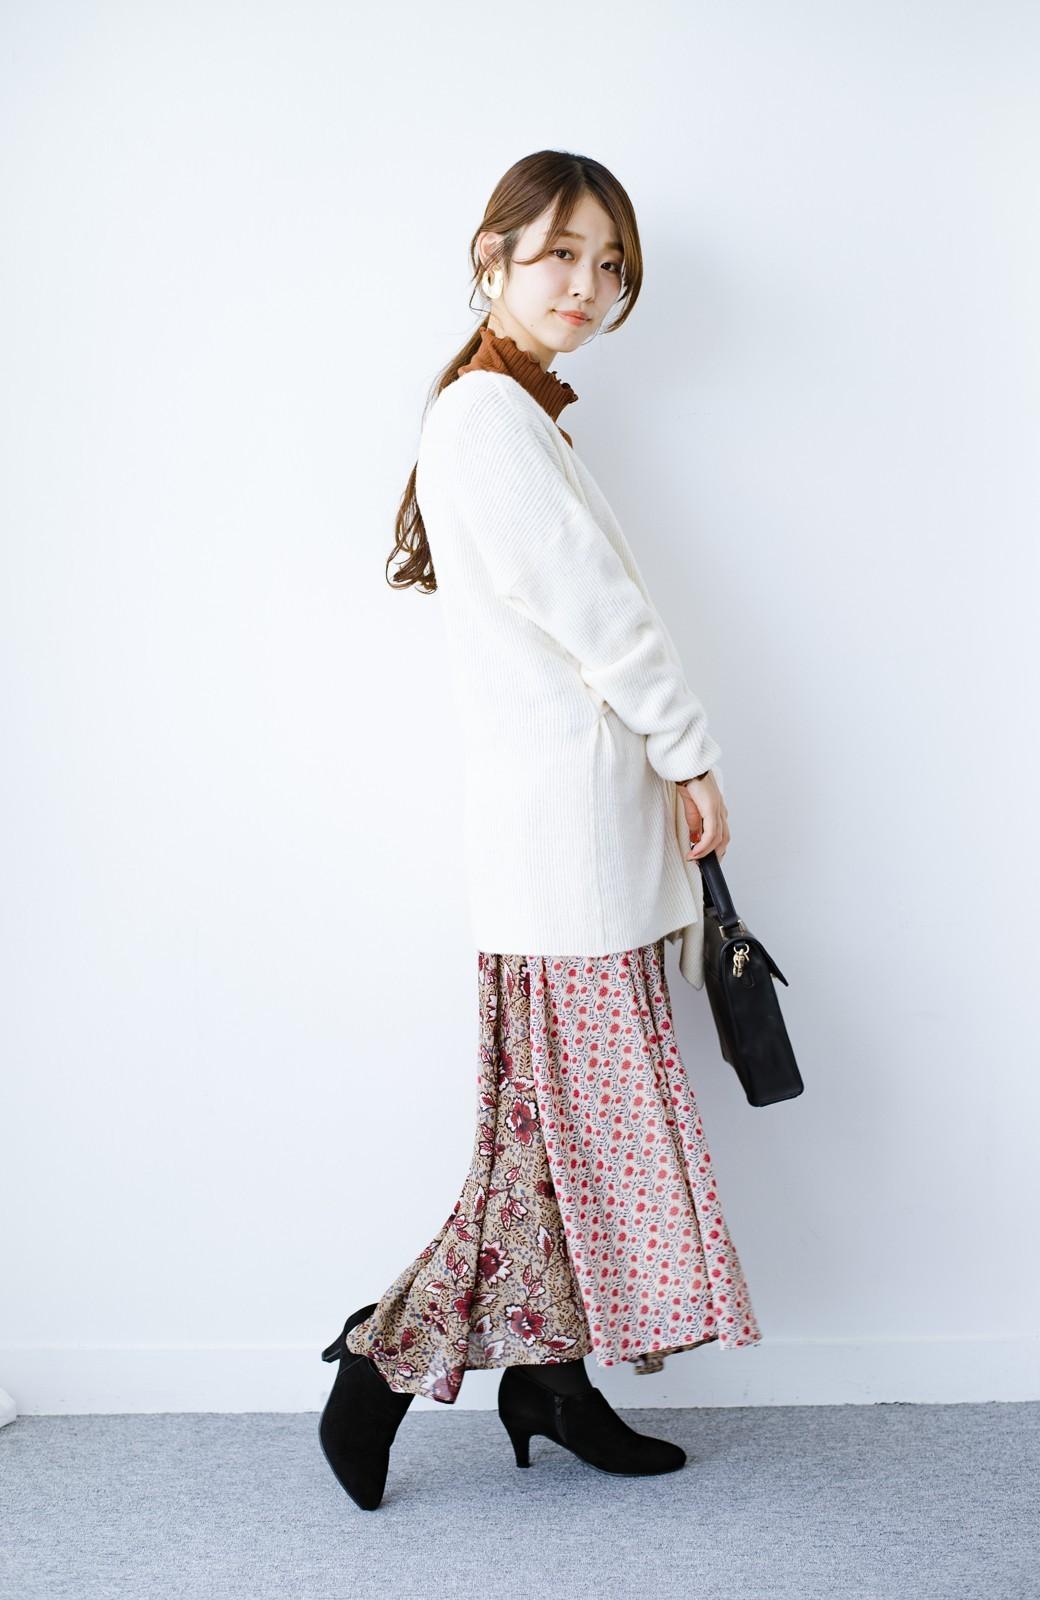 haco! 【洗濯機洗いOK】シンプルなトップスに合わせるだけでかわいくなれる MIX柄スカート <ベージュ系その他>の商品写真7